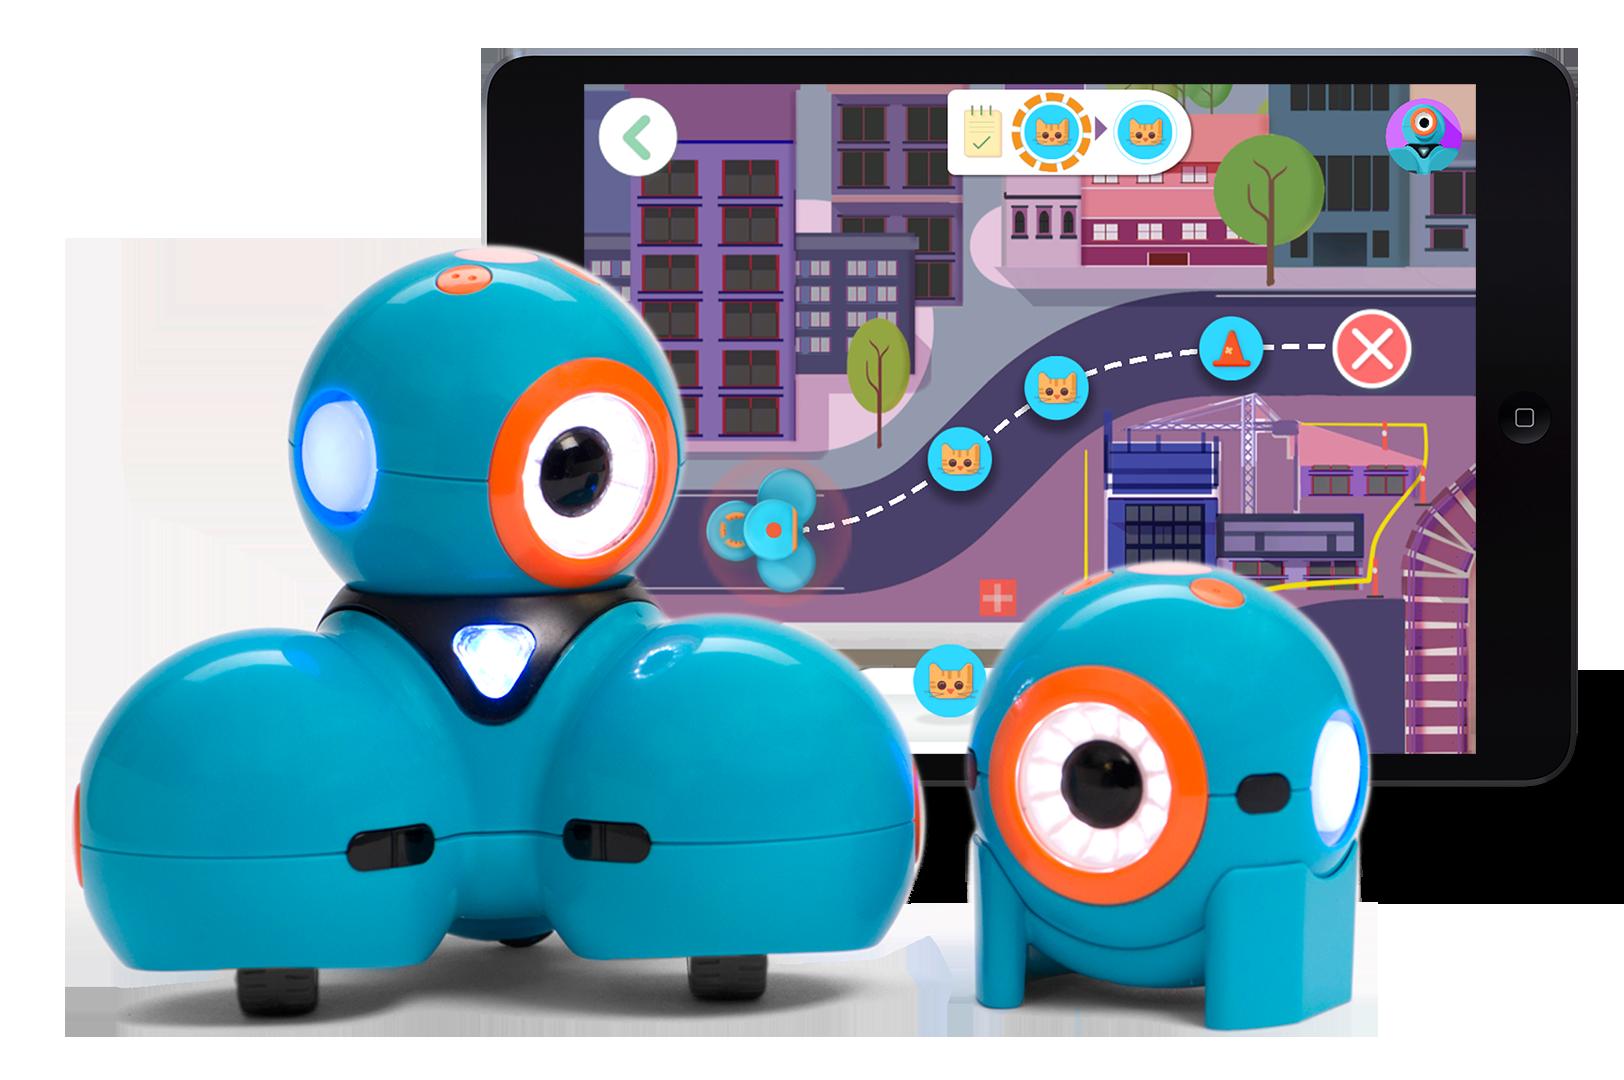 Eyeballs clipart robot. Wonder workshop dash dot